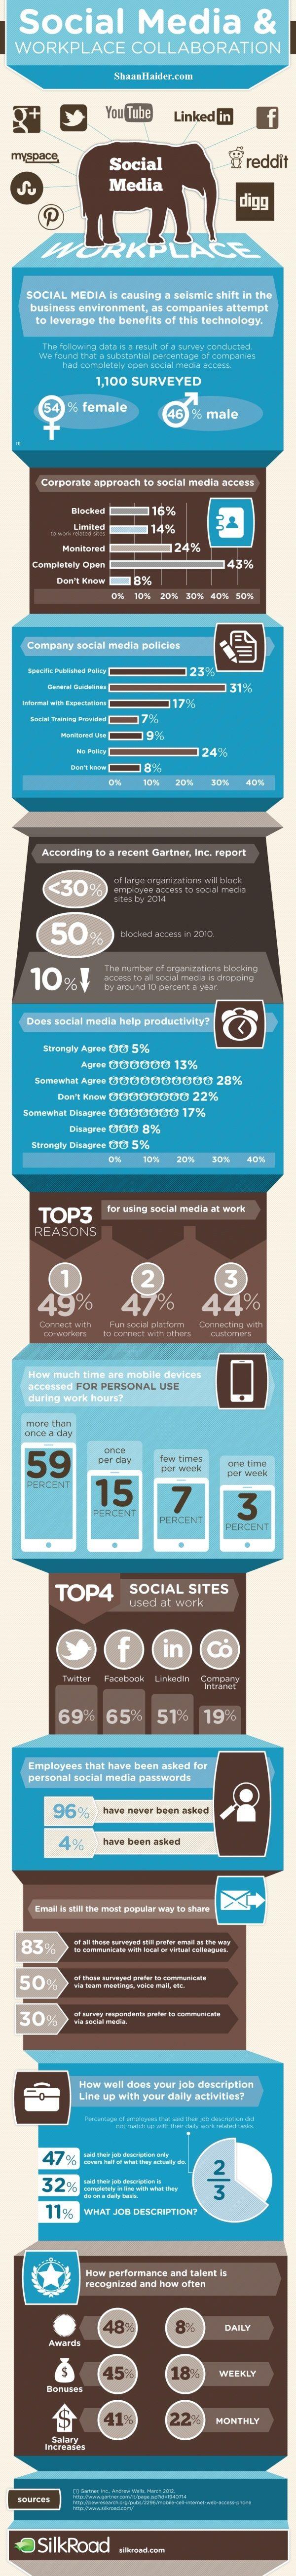 SocialMedia Infographic